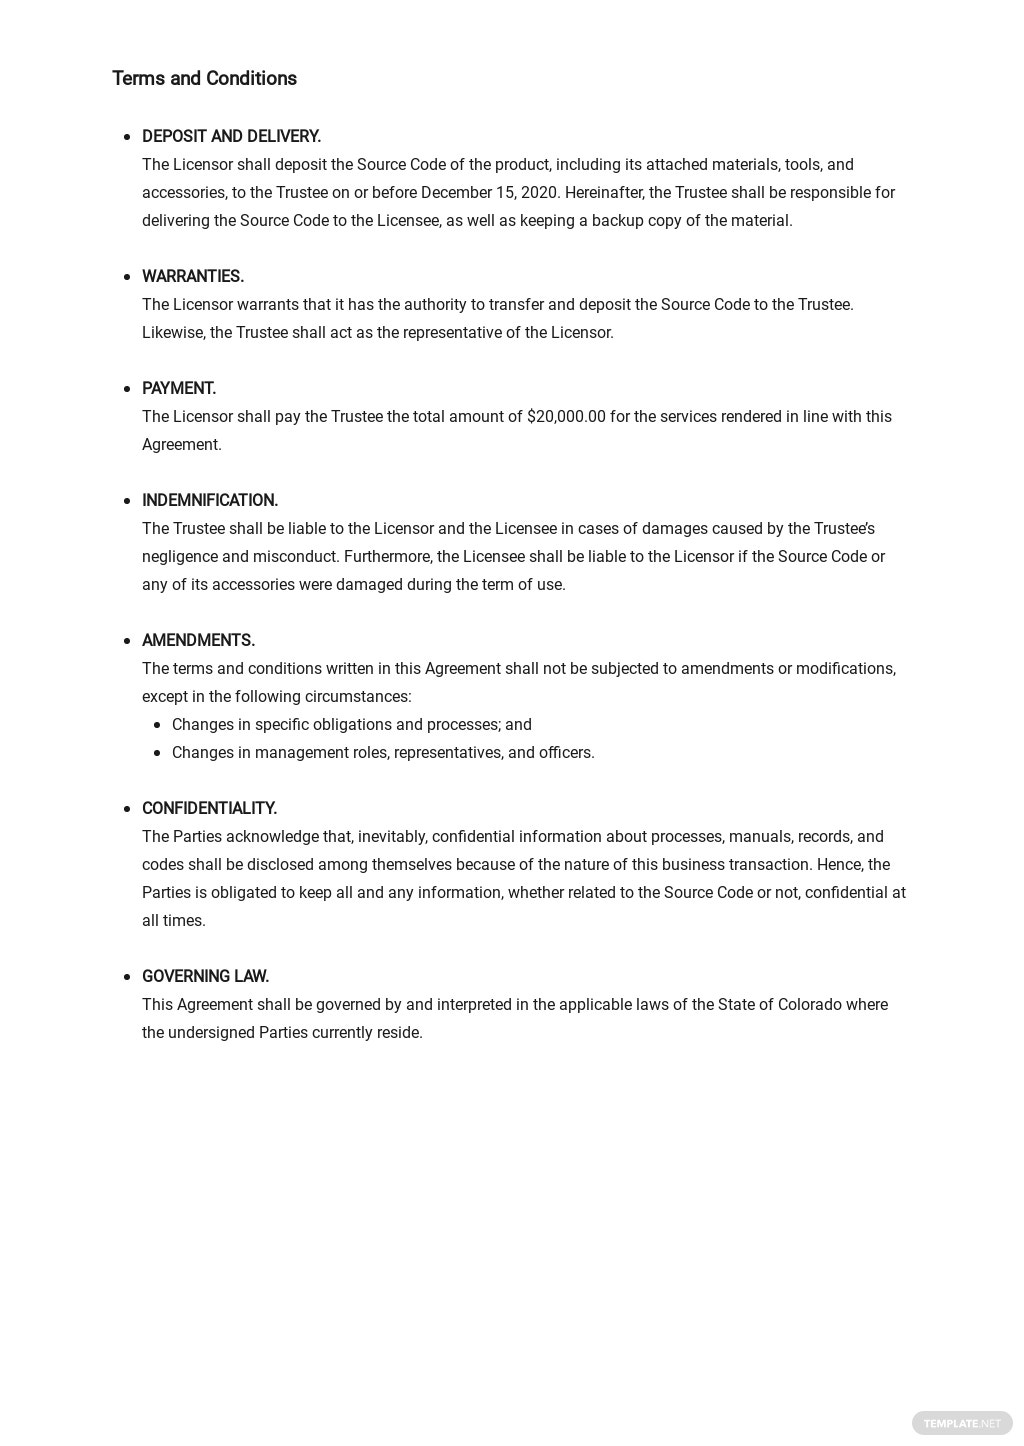 Source Code Trust Agreement Template 2.jpe